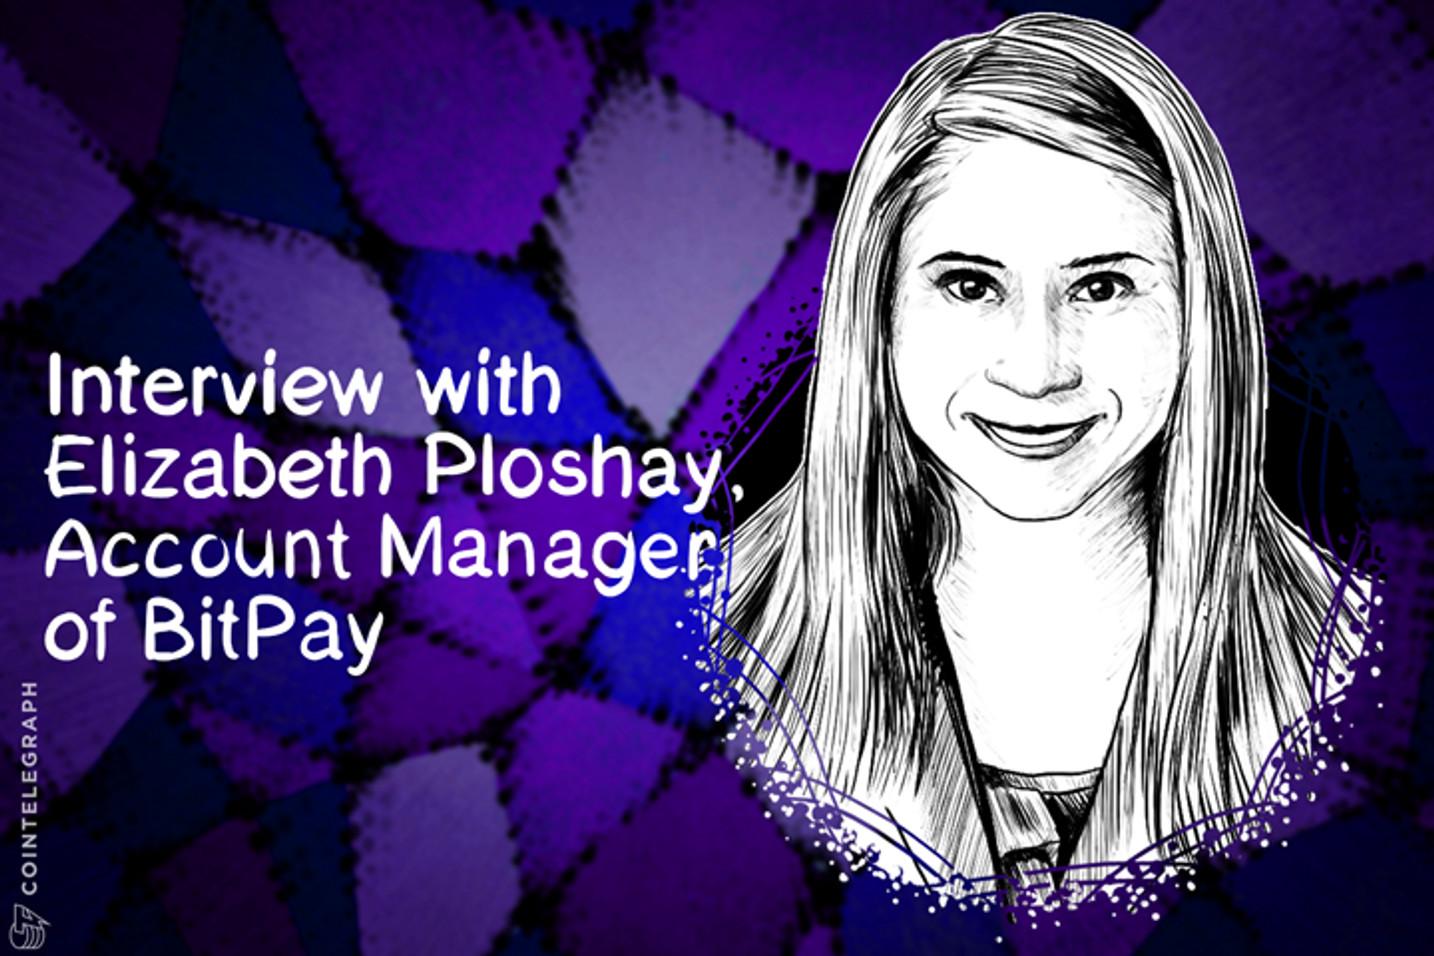 Elizabeth Ploshay: 'The Majority of the Financially Excluded Happen to Be Women'